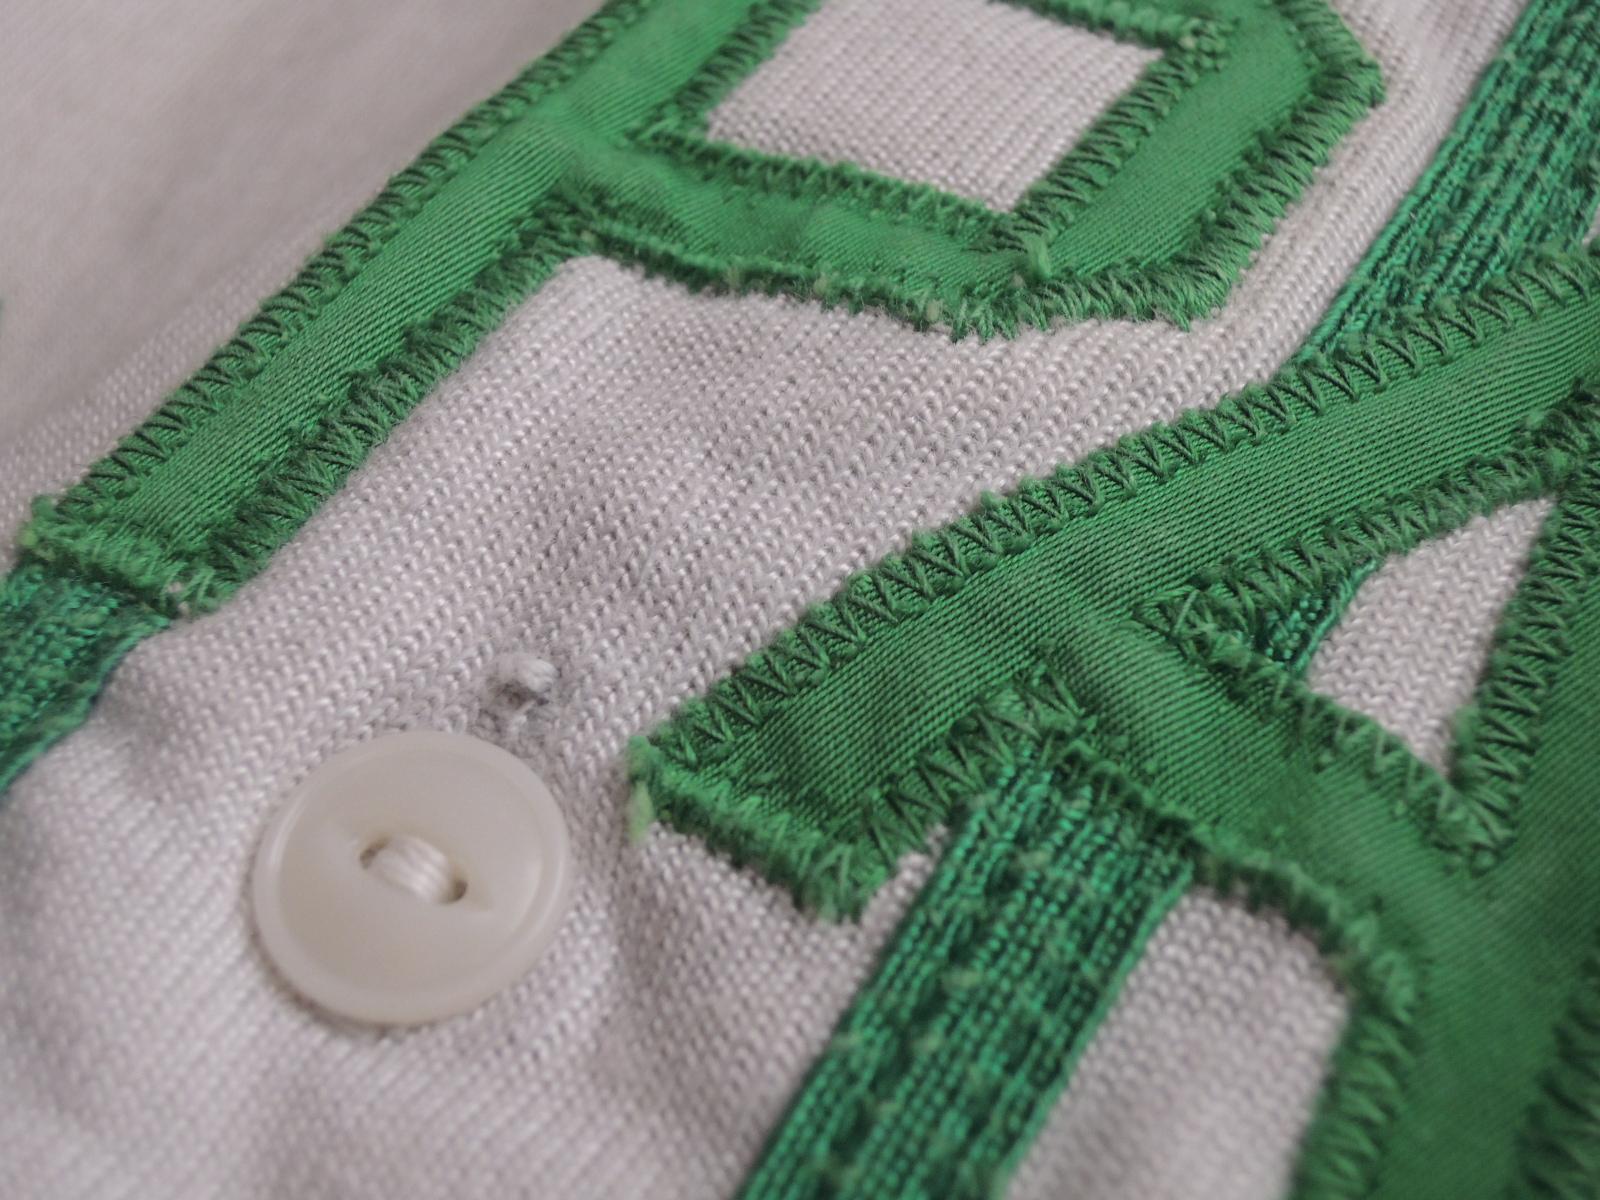 macgregorbaseballshirts06.JPG